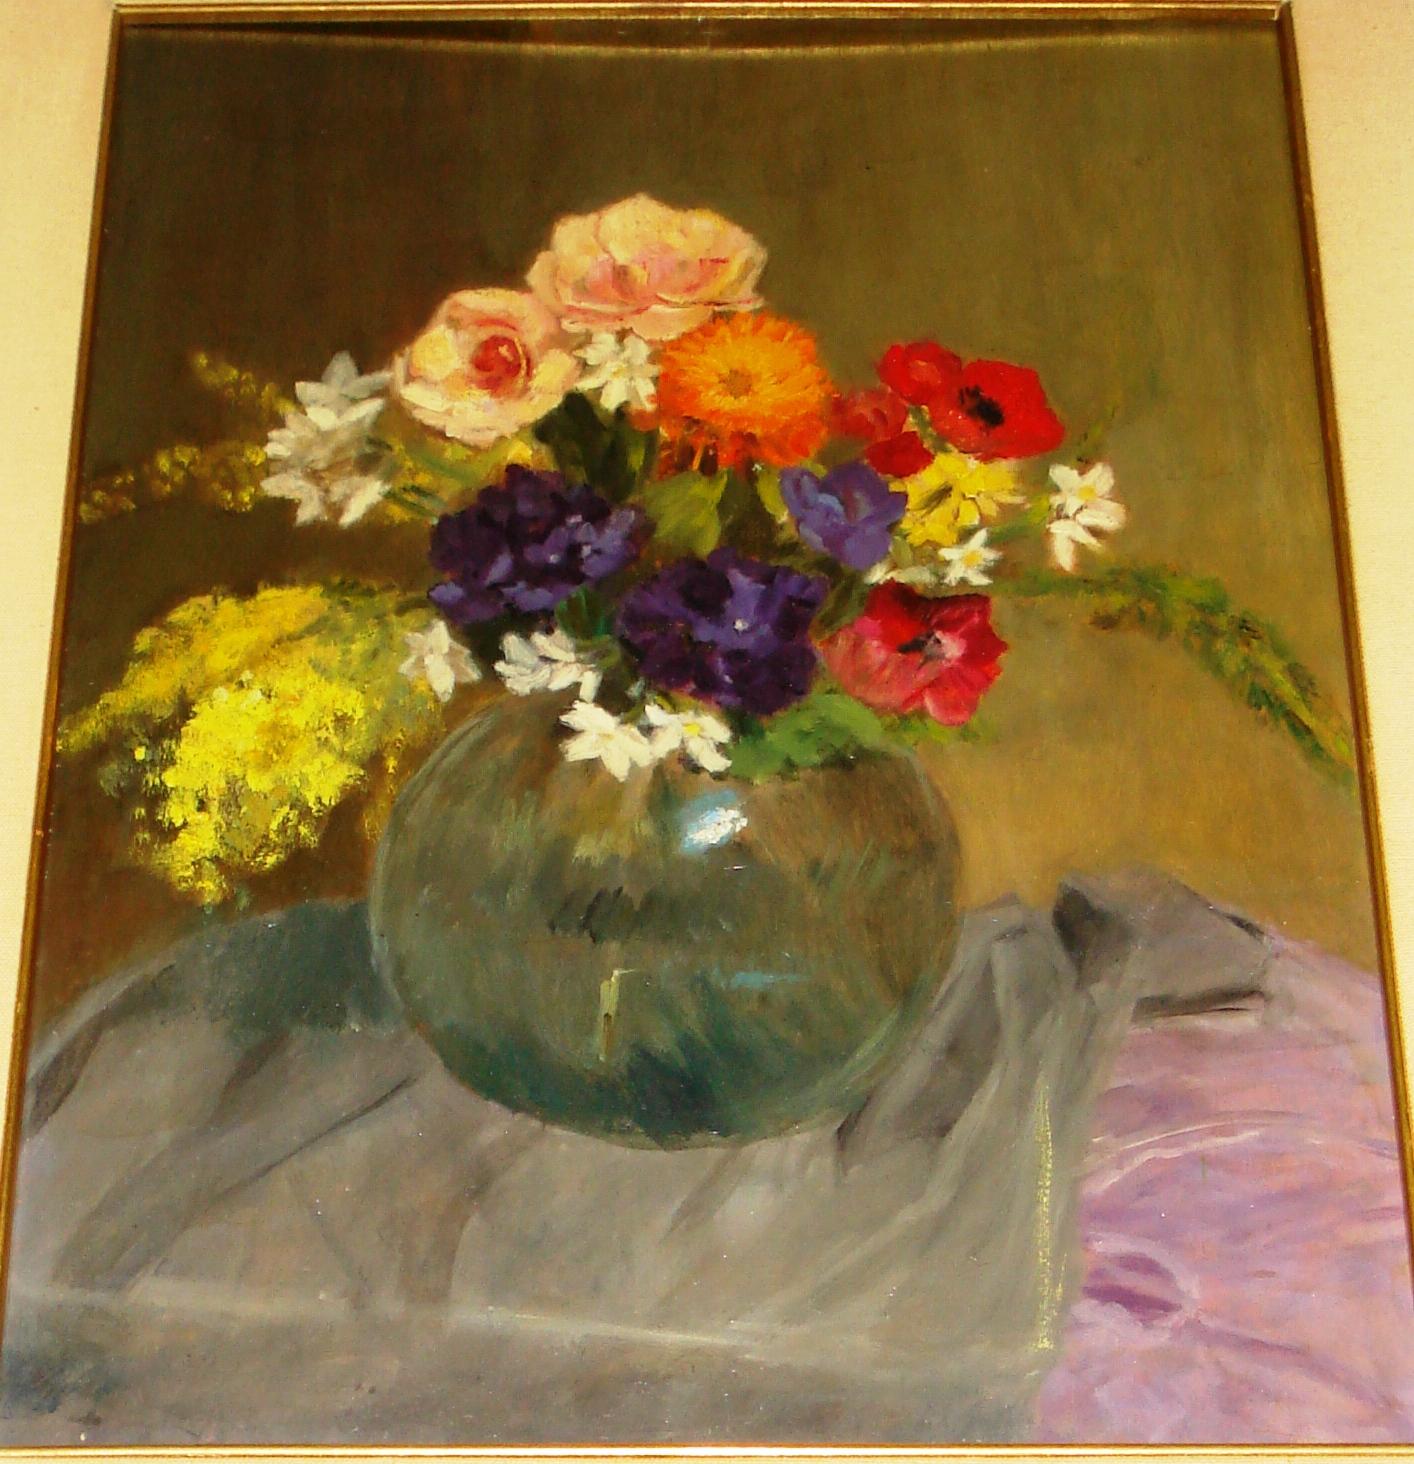 Clara boriosi mimosa e rose in un vaso verde for Mimosa in vaso